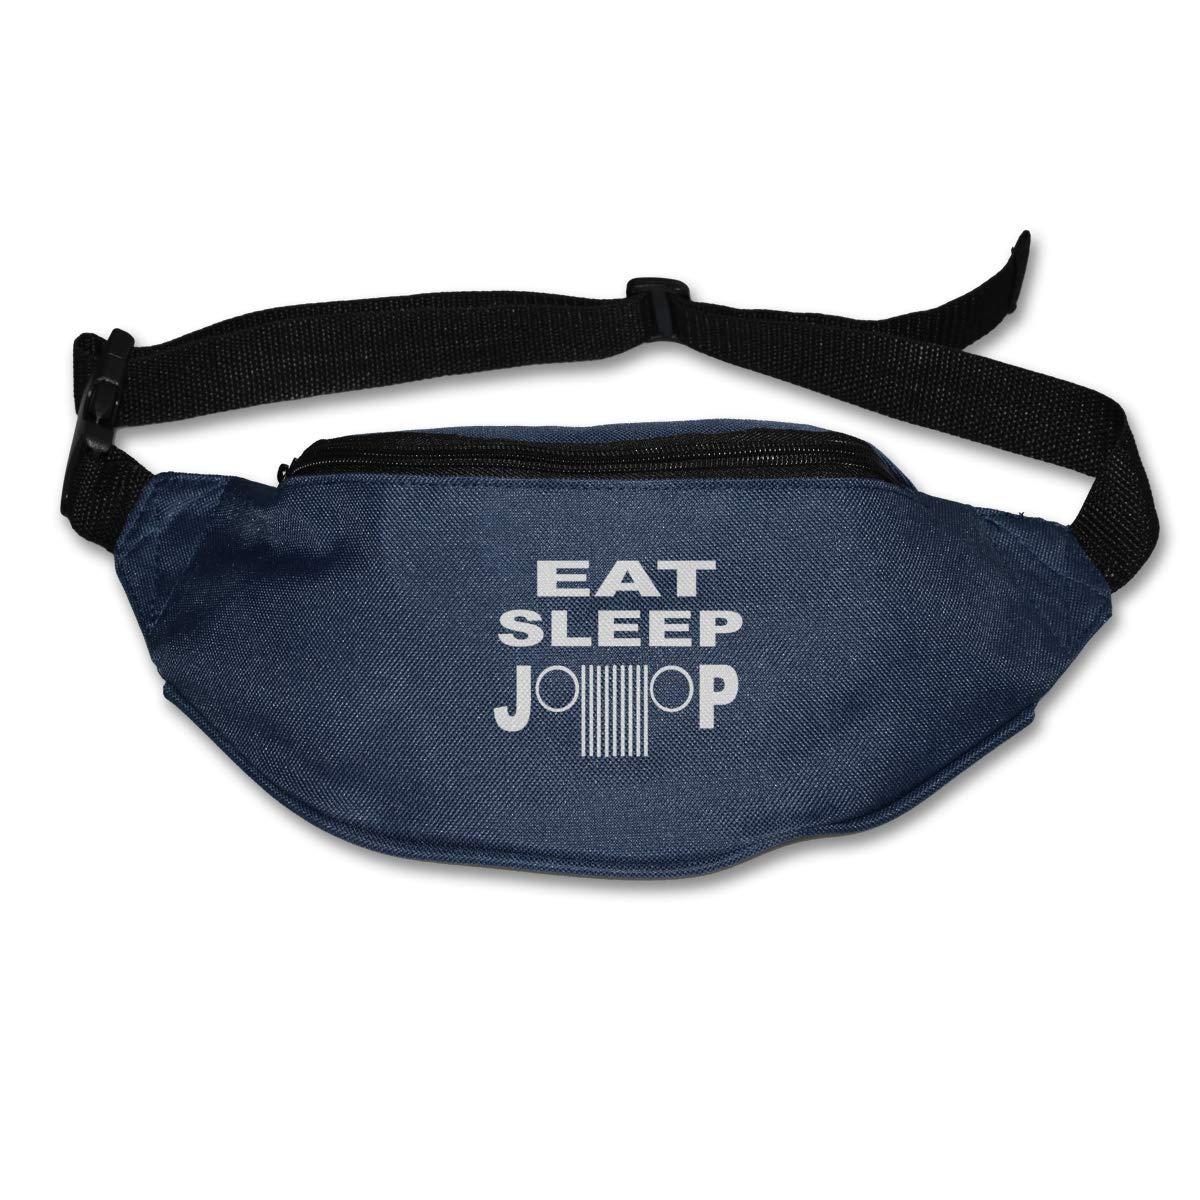 Eat Sleep Jeep Funny Sport Waist Packs Fanny Pack Adjustable For Run